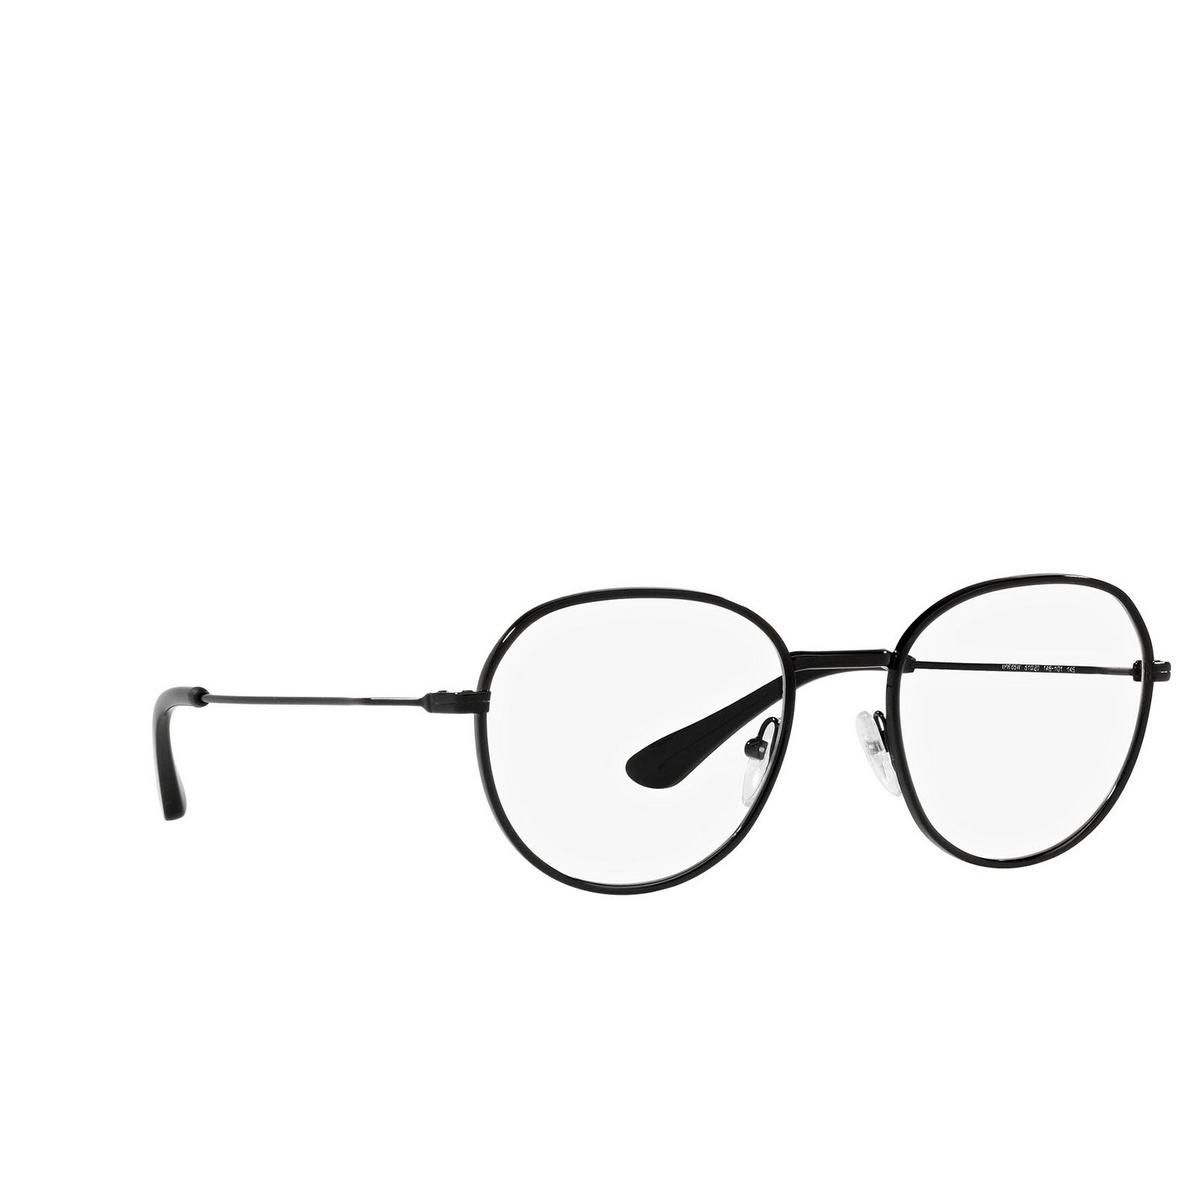 Prada® Oval Eyeglasses: PR 65WV color Matte Black 1BO1O1 - three-quarters view.